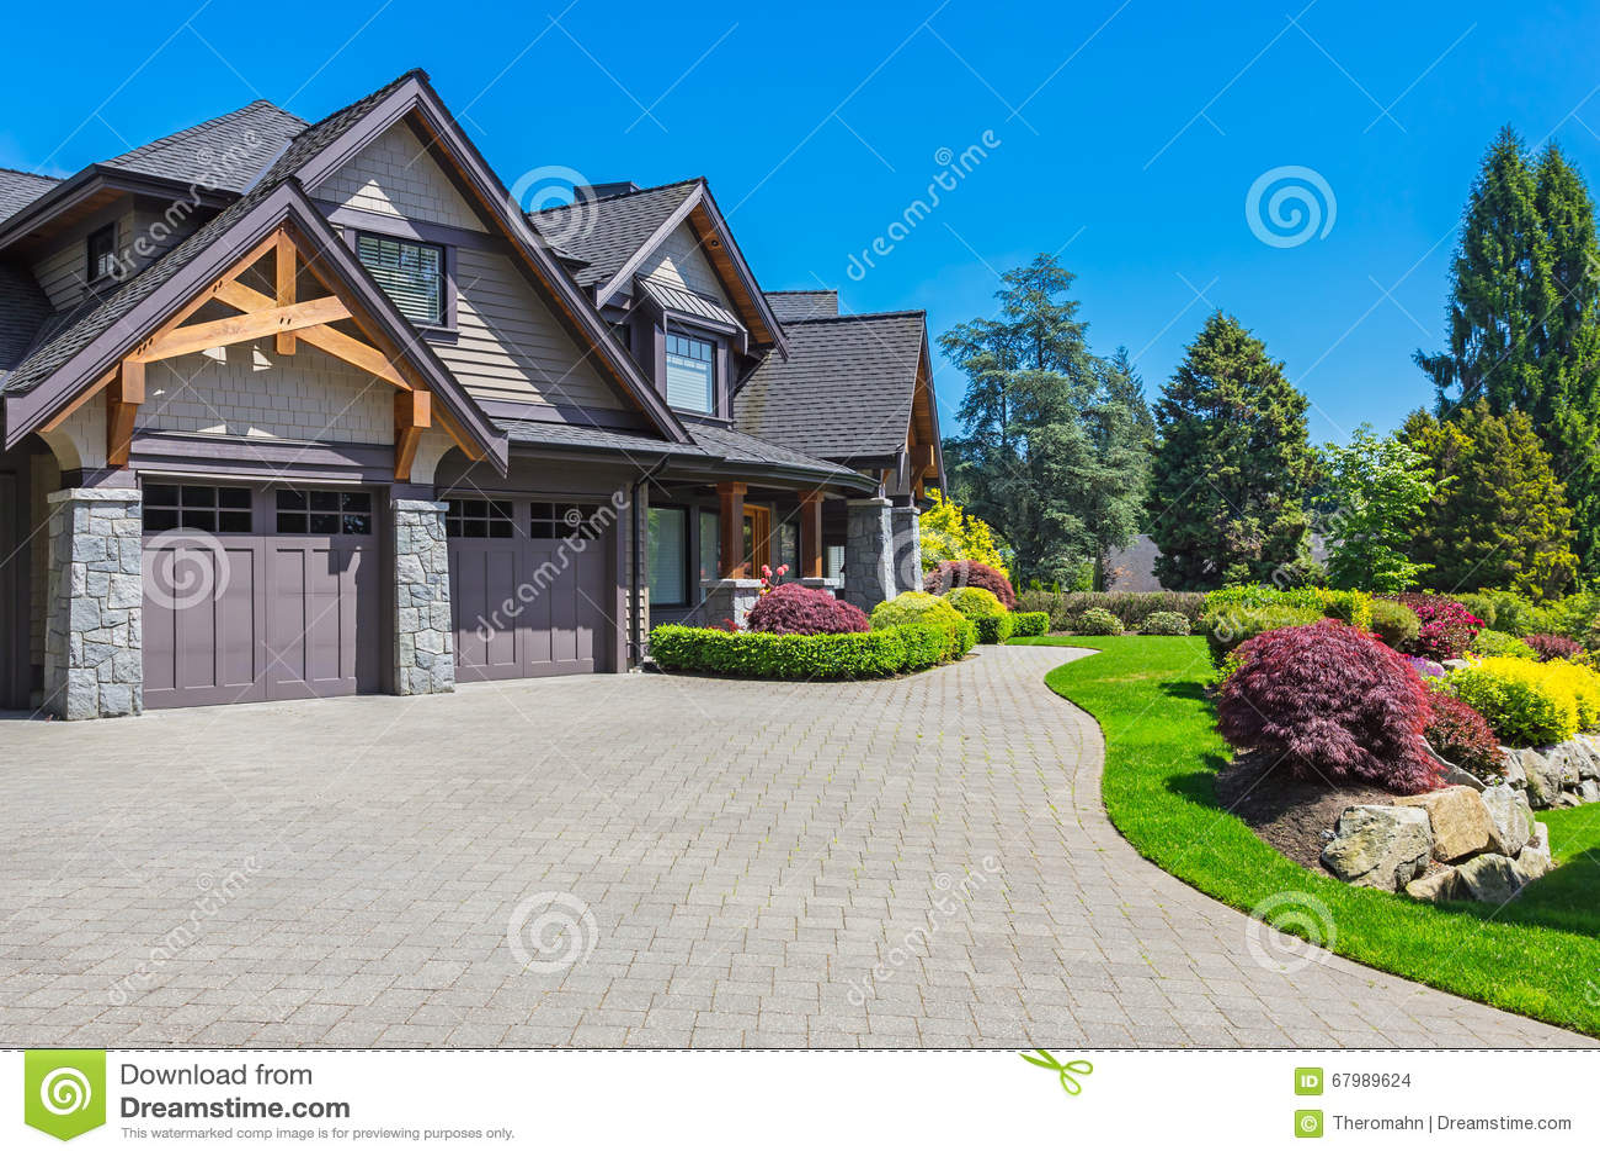 Custom Built House Stock Photo Image 67989624